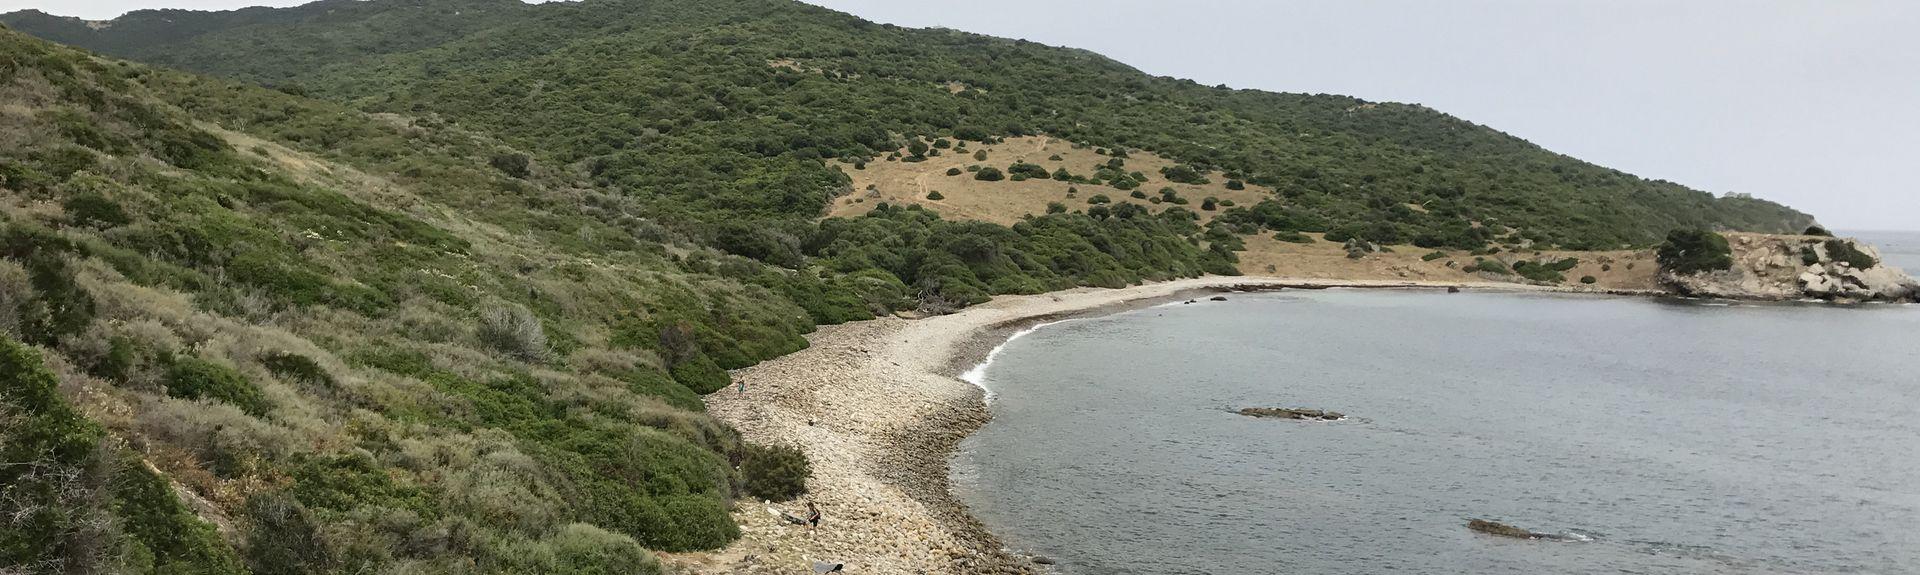 Monte Hacho, Ceuta, Spain